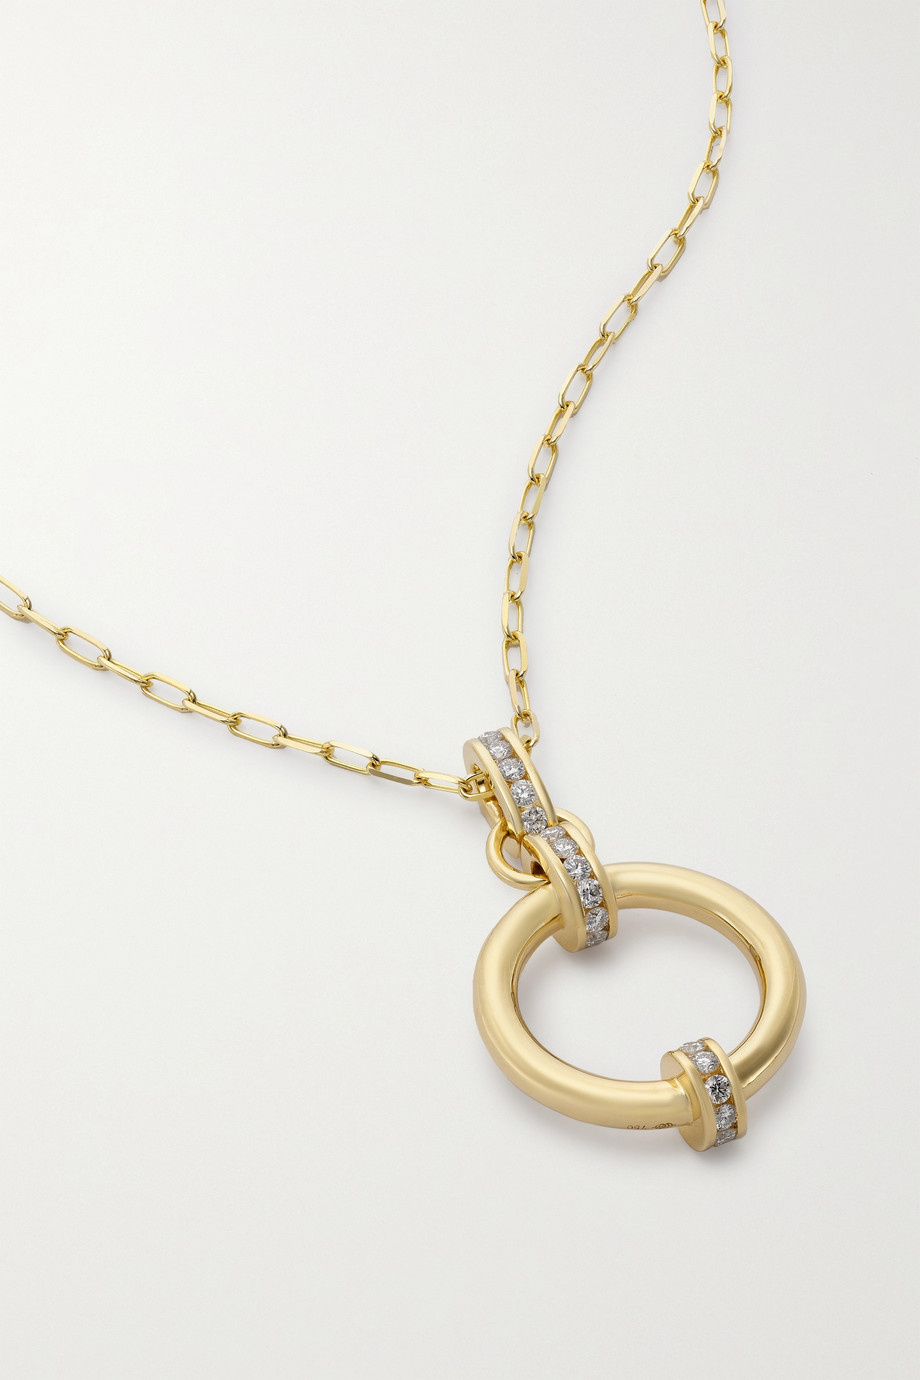 State Property Idris 18-karat gold diamond necklace